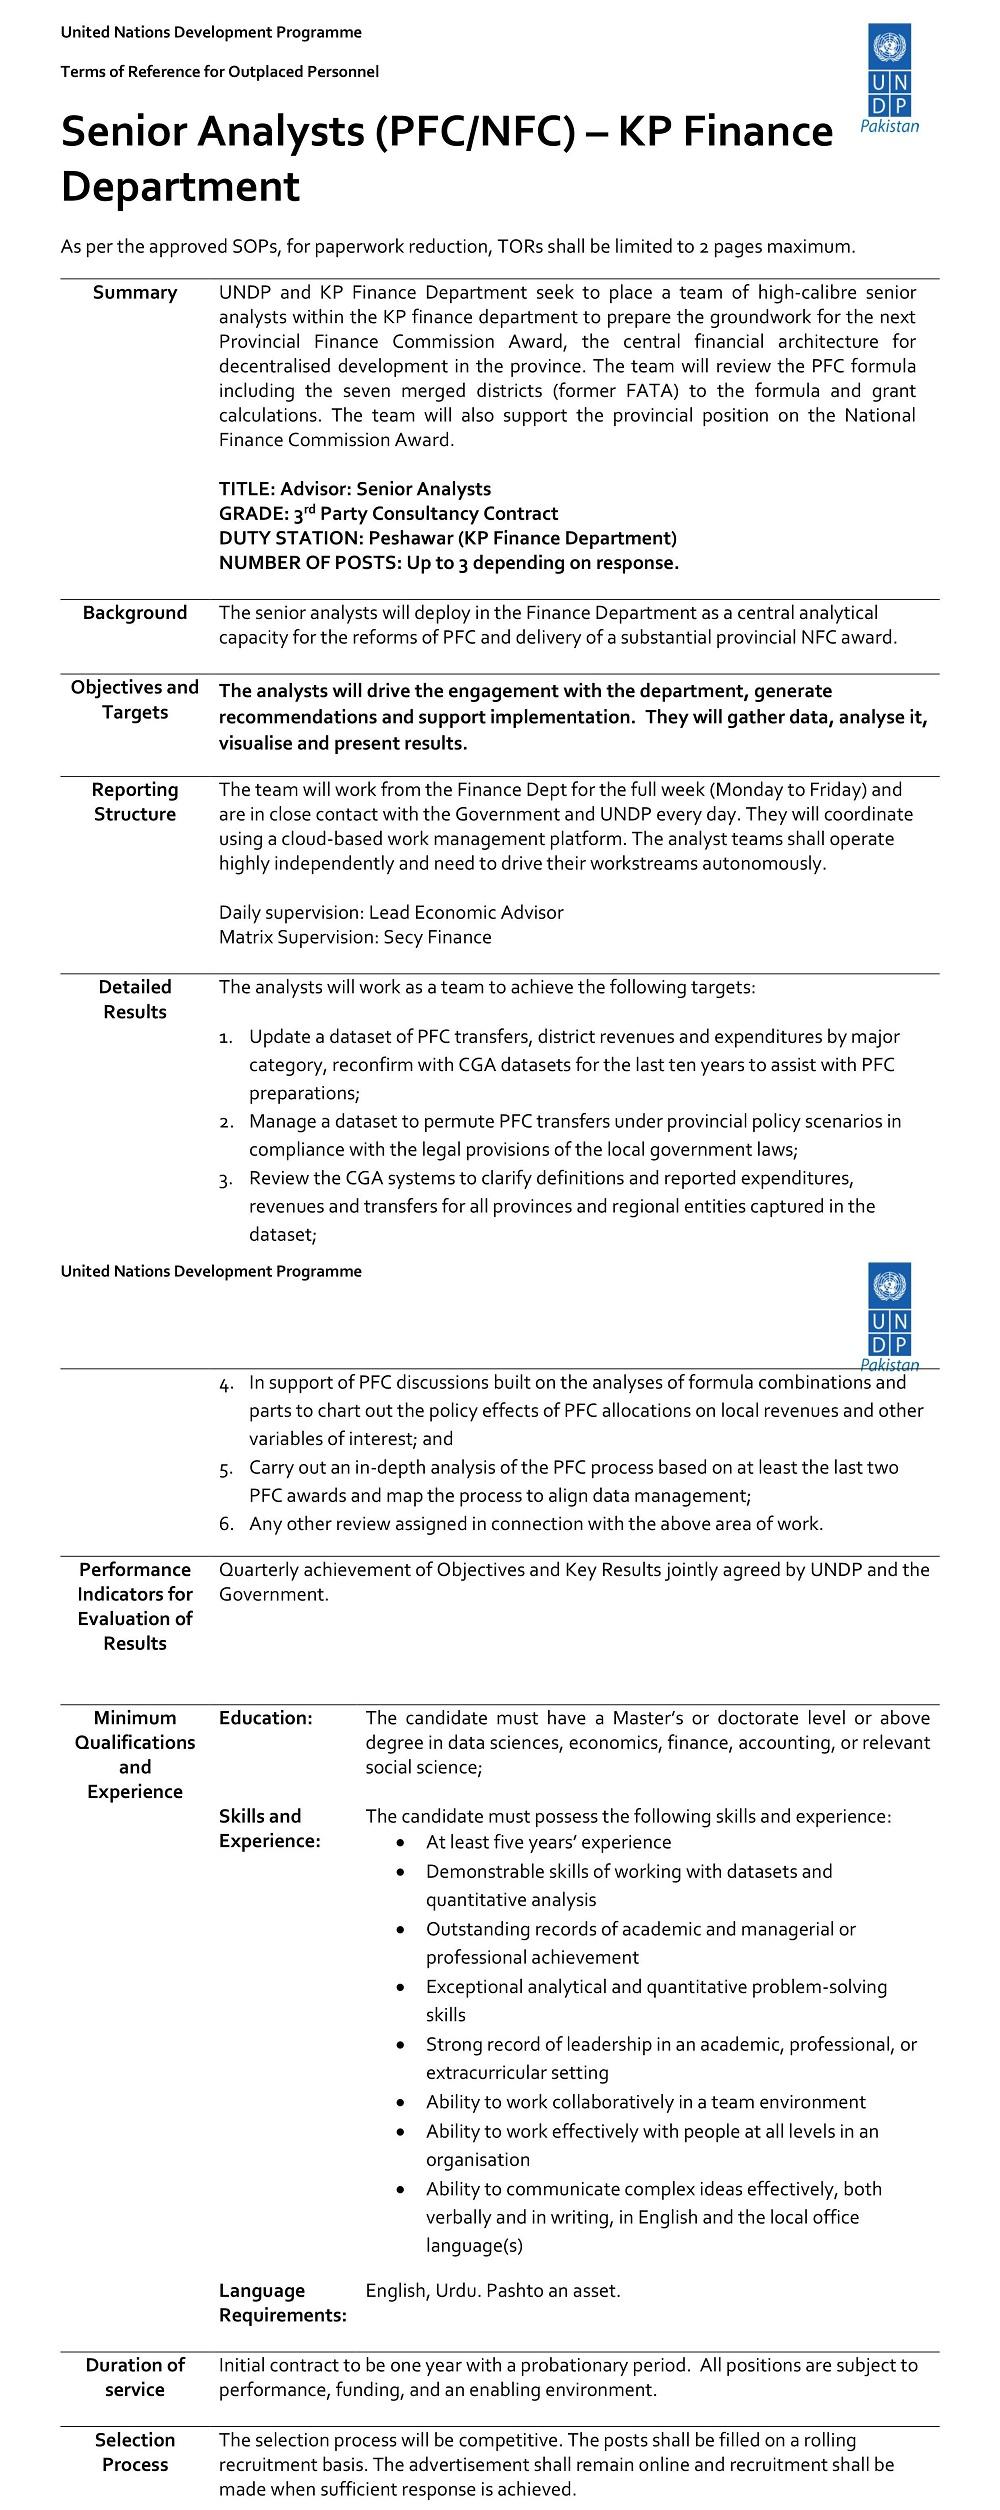 United Nations Development Programme UNDP NGO Job 2020